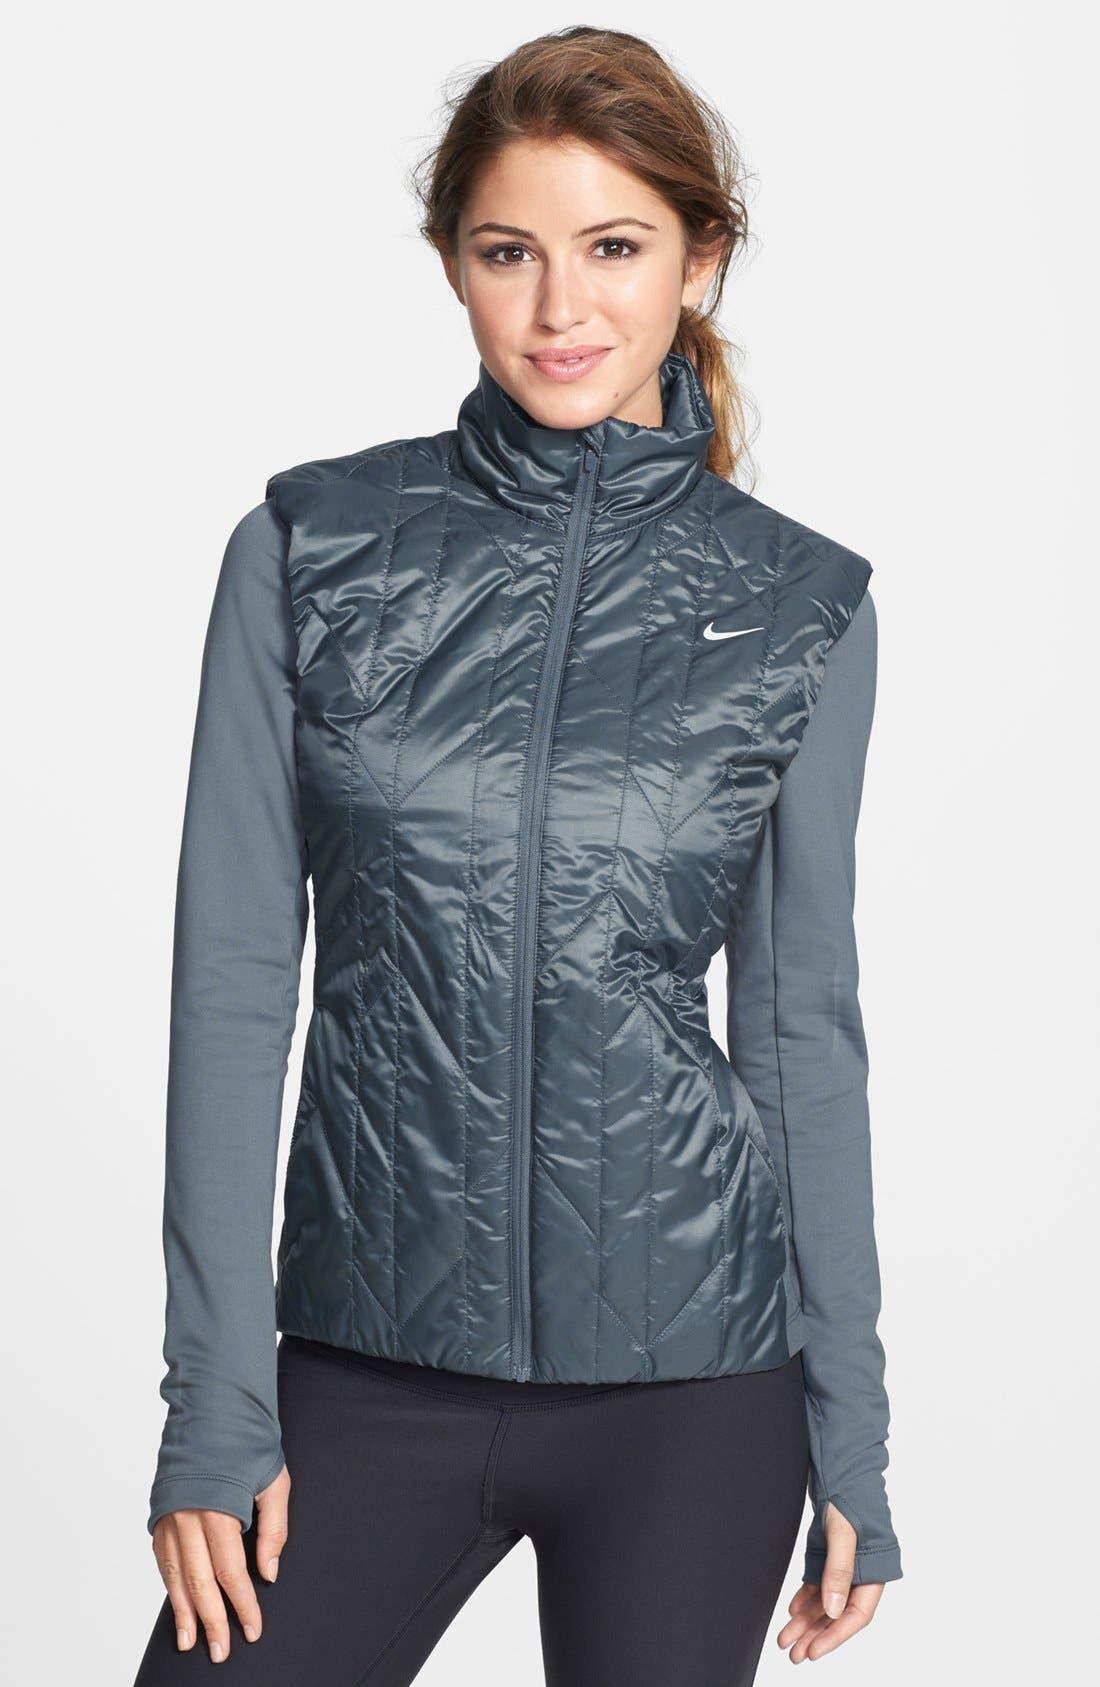 Alternate Image 1 Selected - Nike 'Bowerman' PrimaLoft® Hybrid Jacket